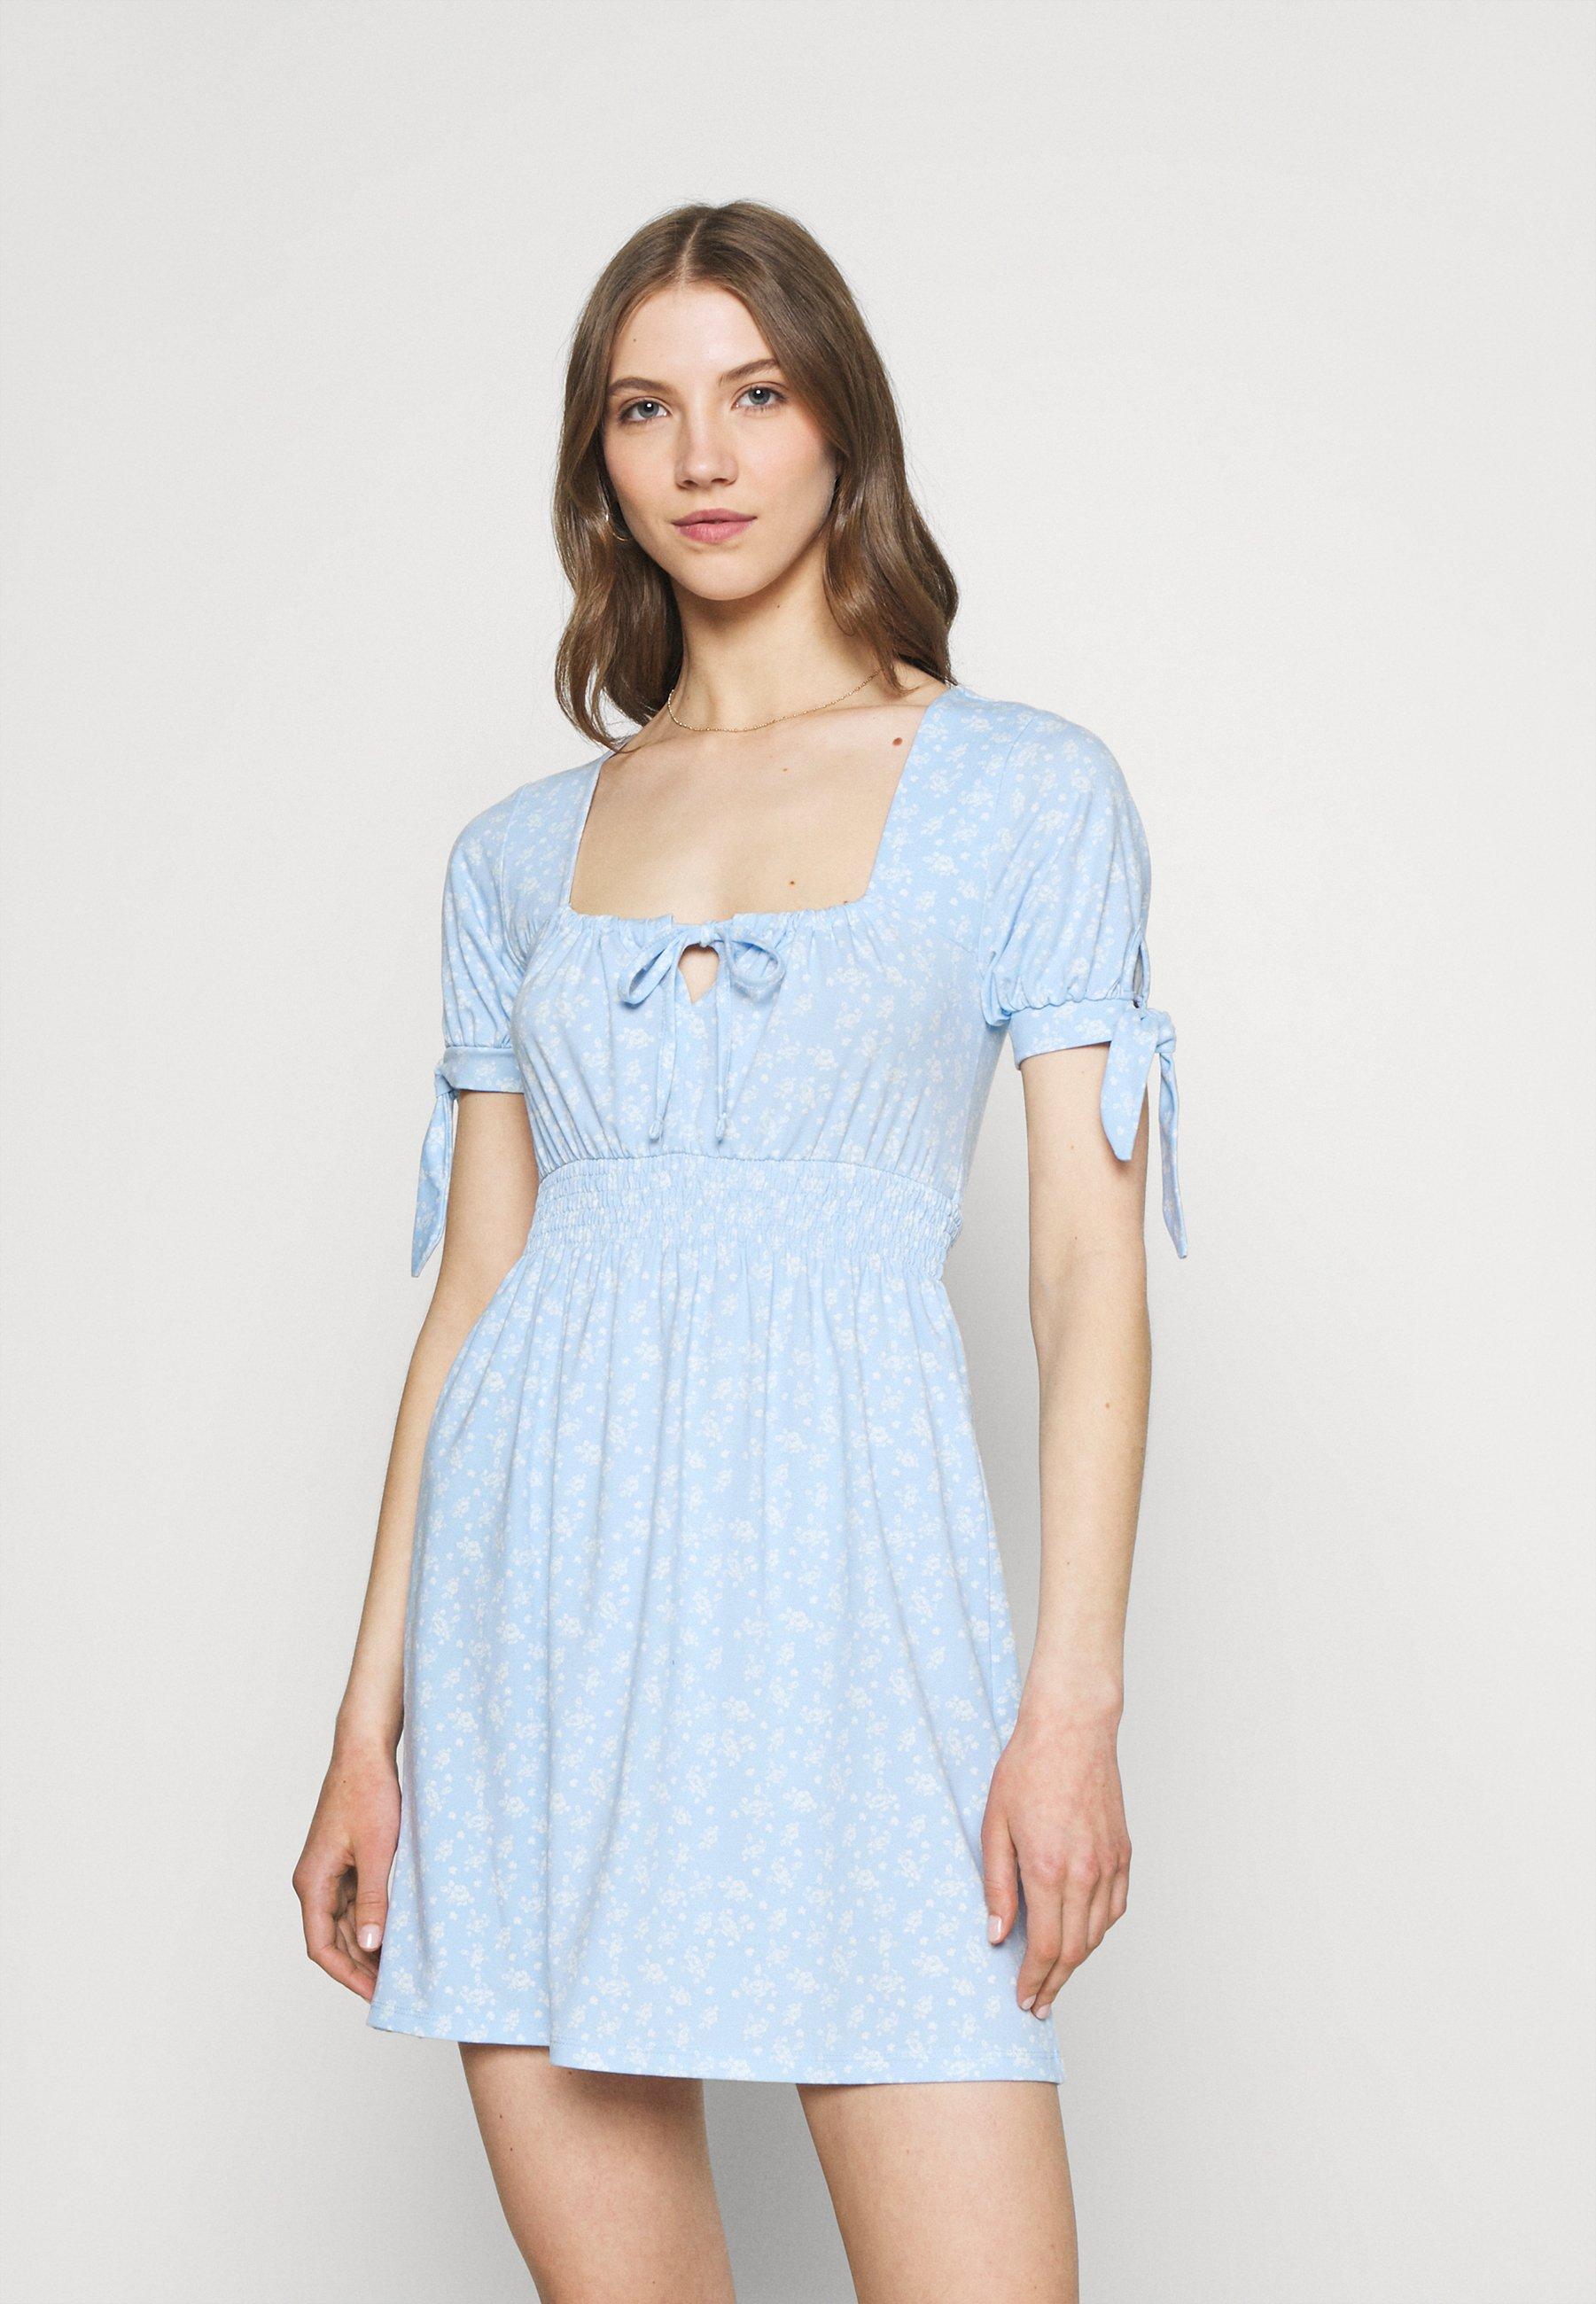 Women PAMELA REIF X ZALANDO RUCHED DETAIL MINI DRESS - Jersey dress